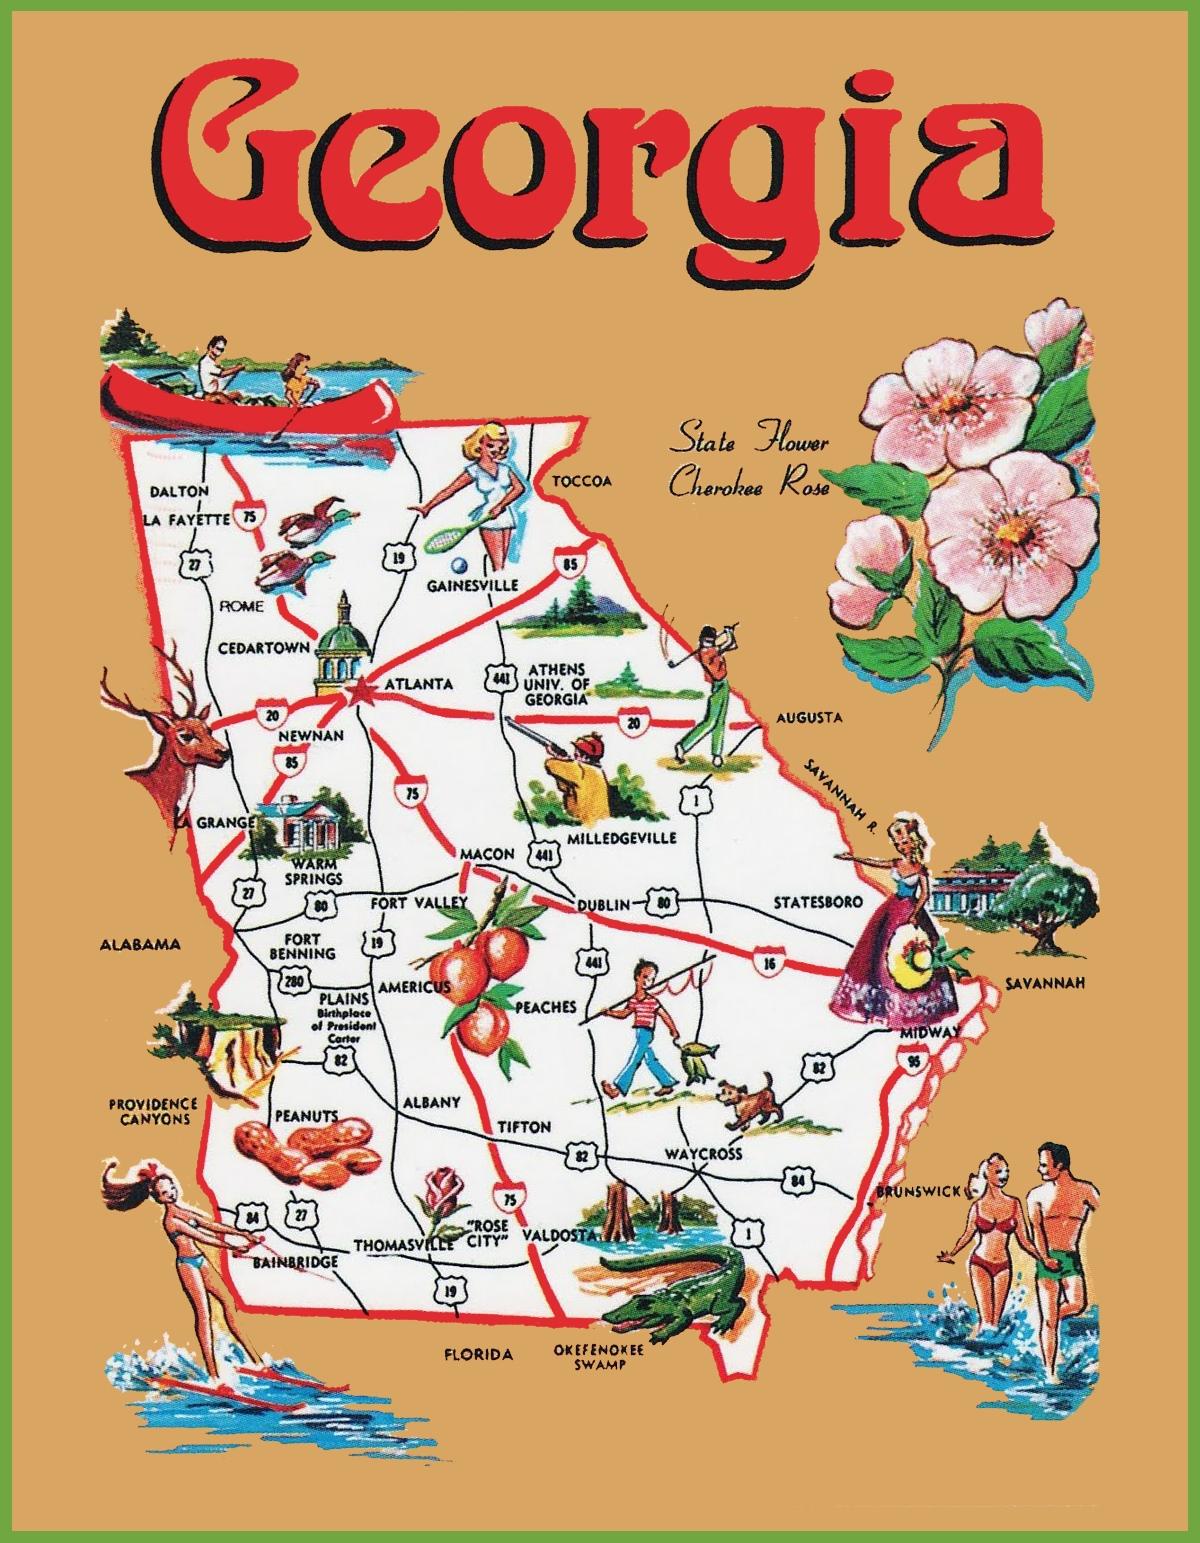 Maps Of Georgia Pictorial travel map of Georgia Maps Of Georgia